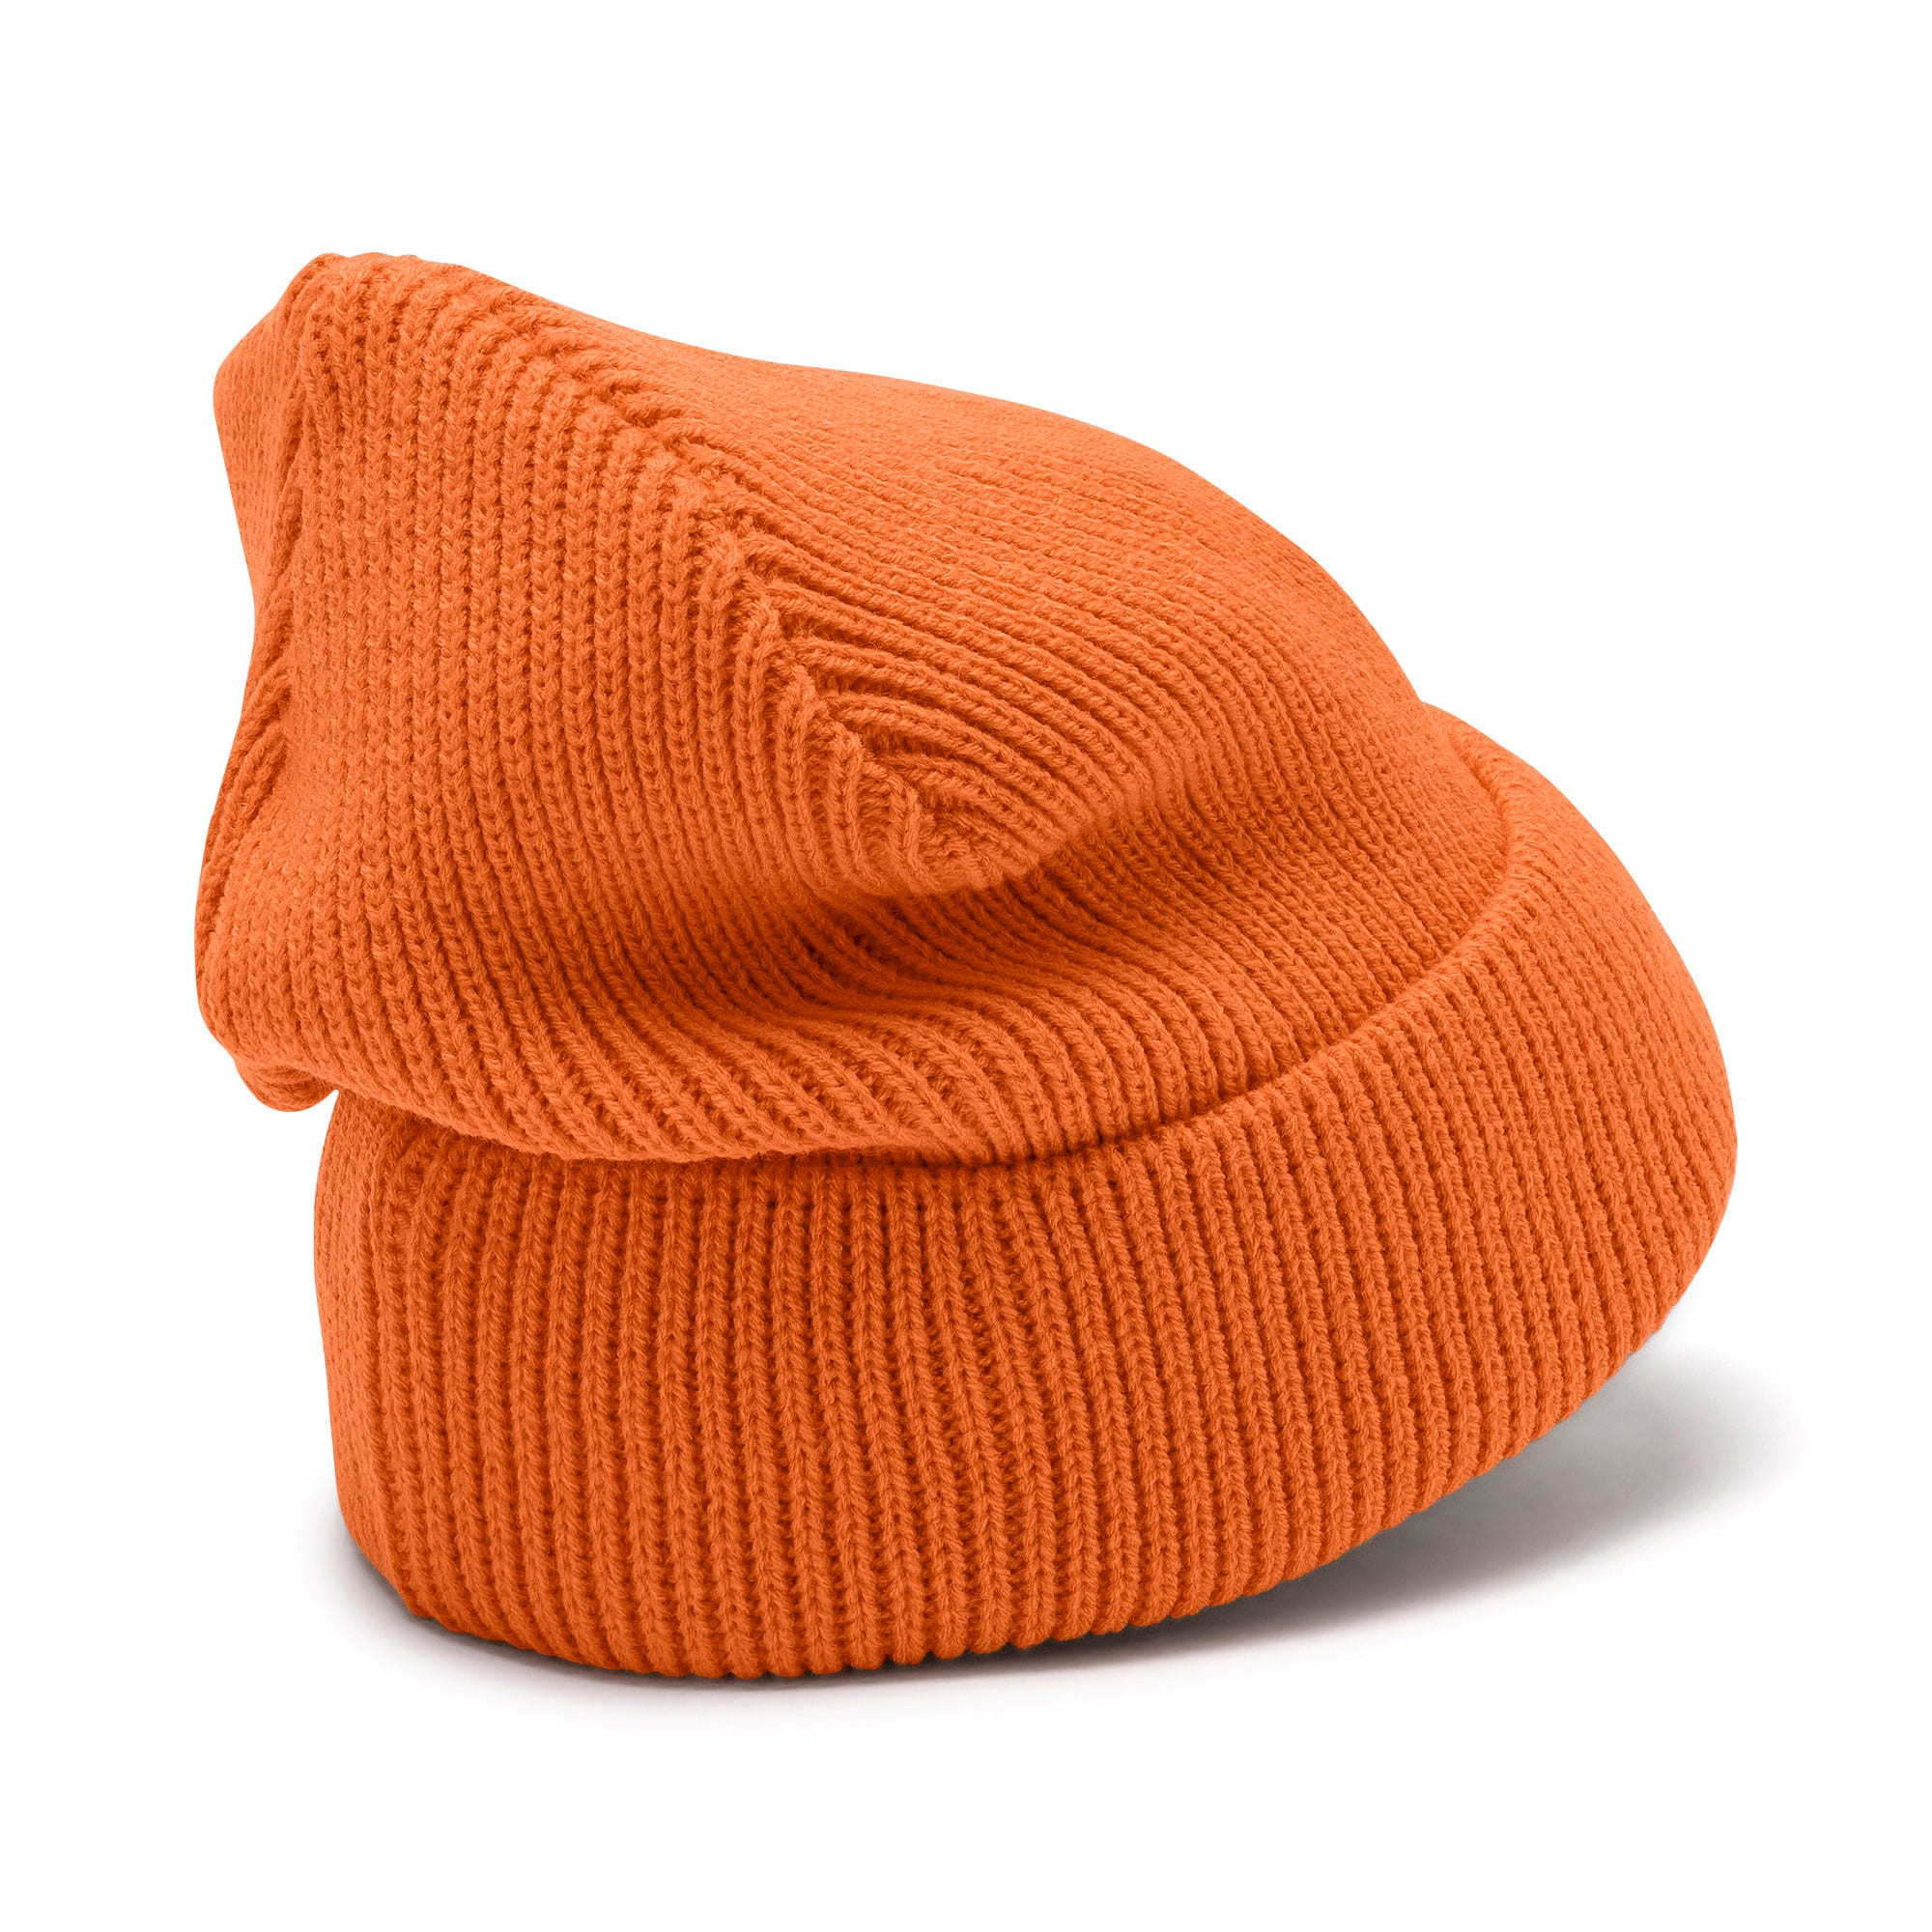 Thumbnail 3 of Classic Ribbed Beanie, Jaffa Orange, medium